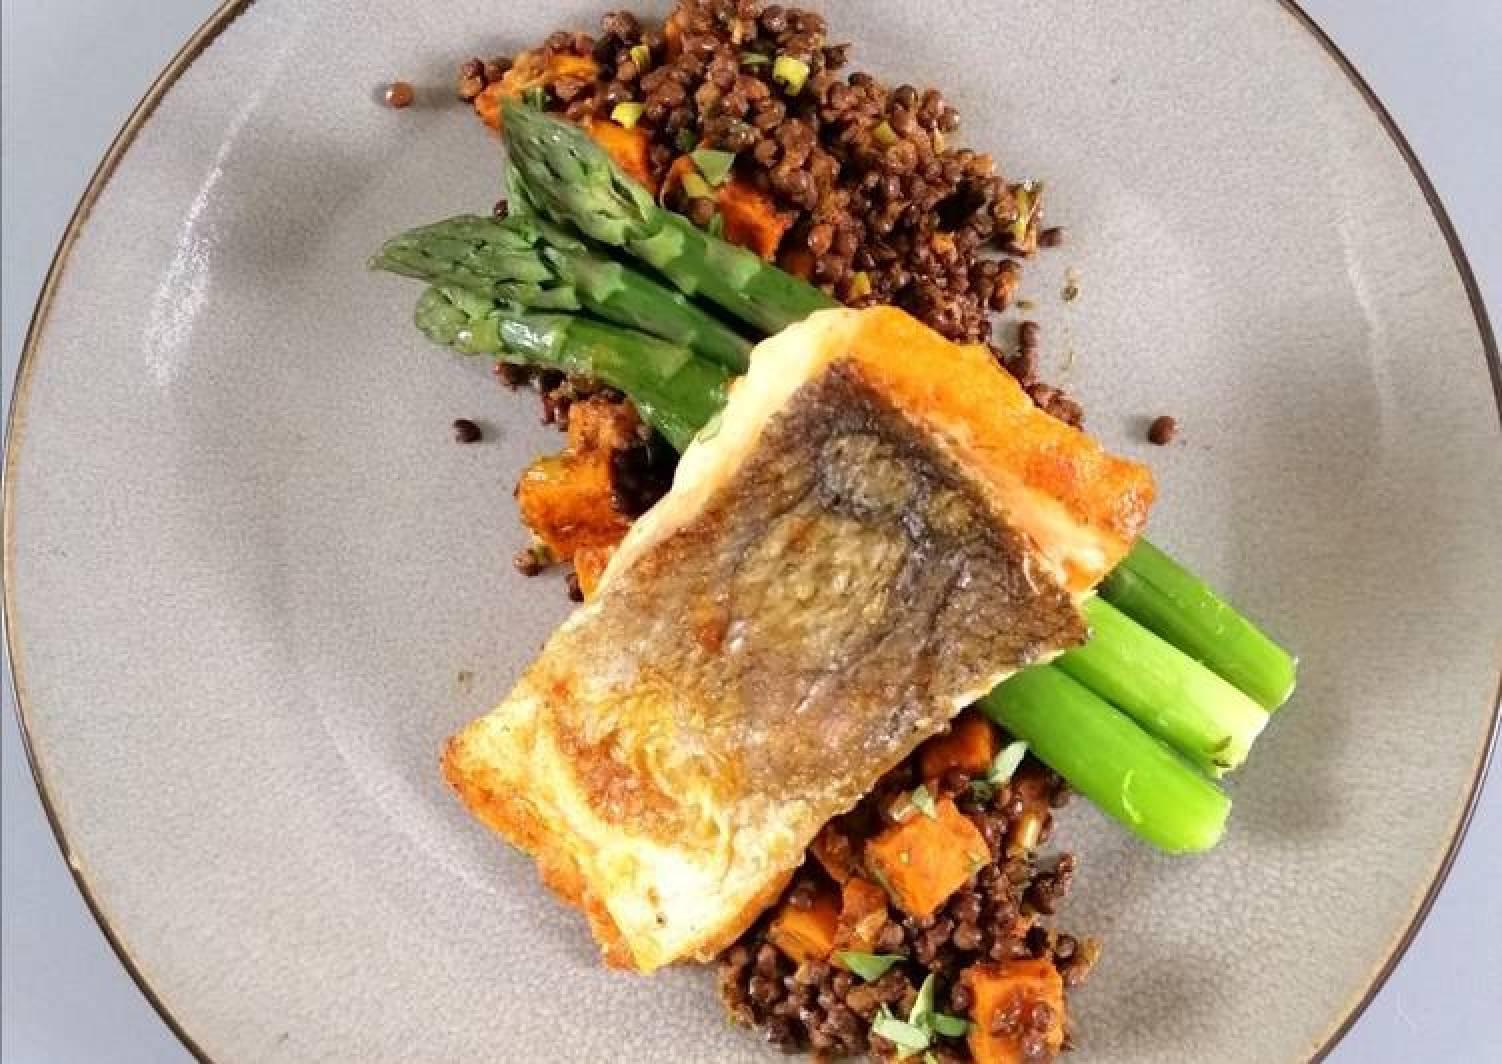 Salmon/sweet potato/black lentil/sundried tom pesto/asparagus